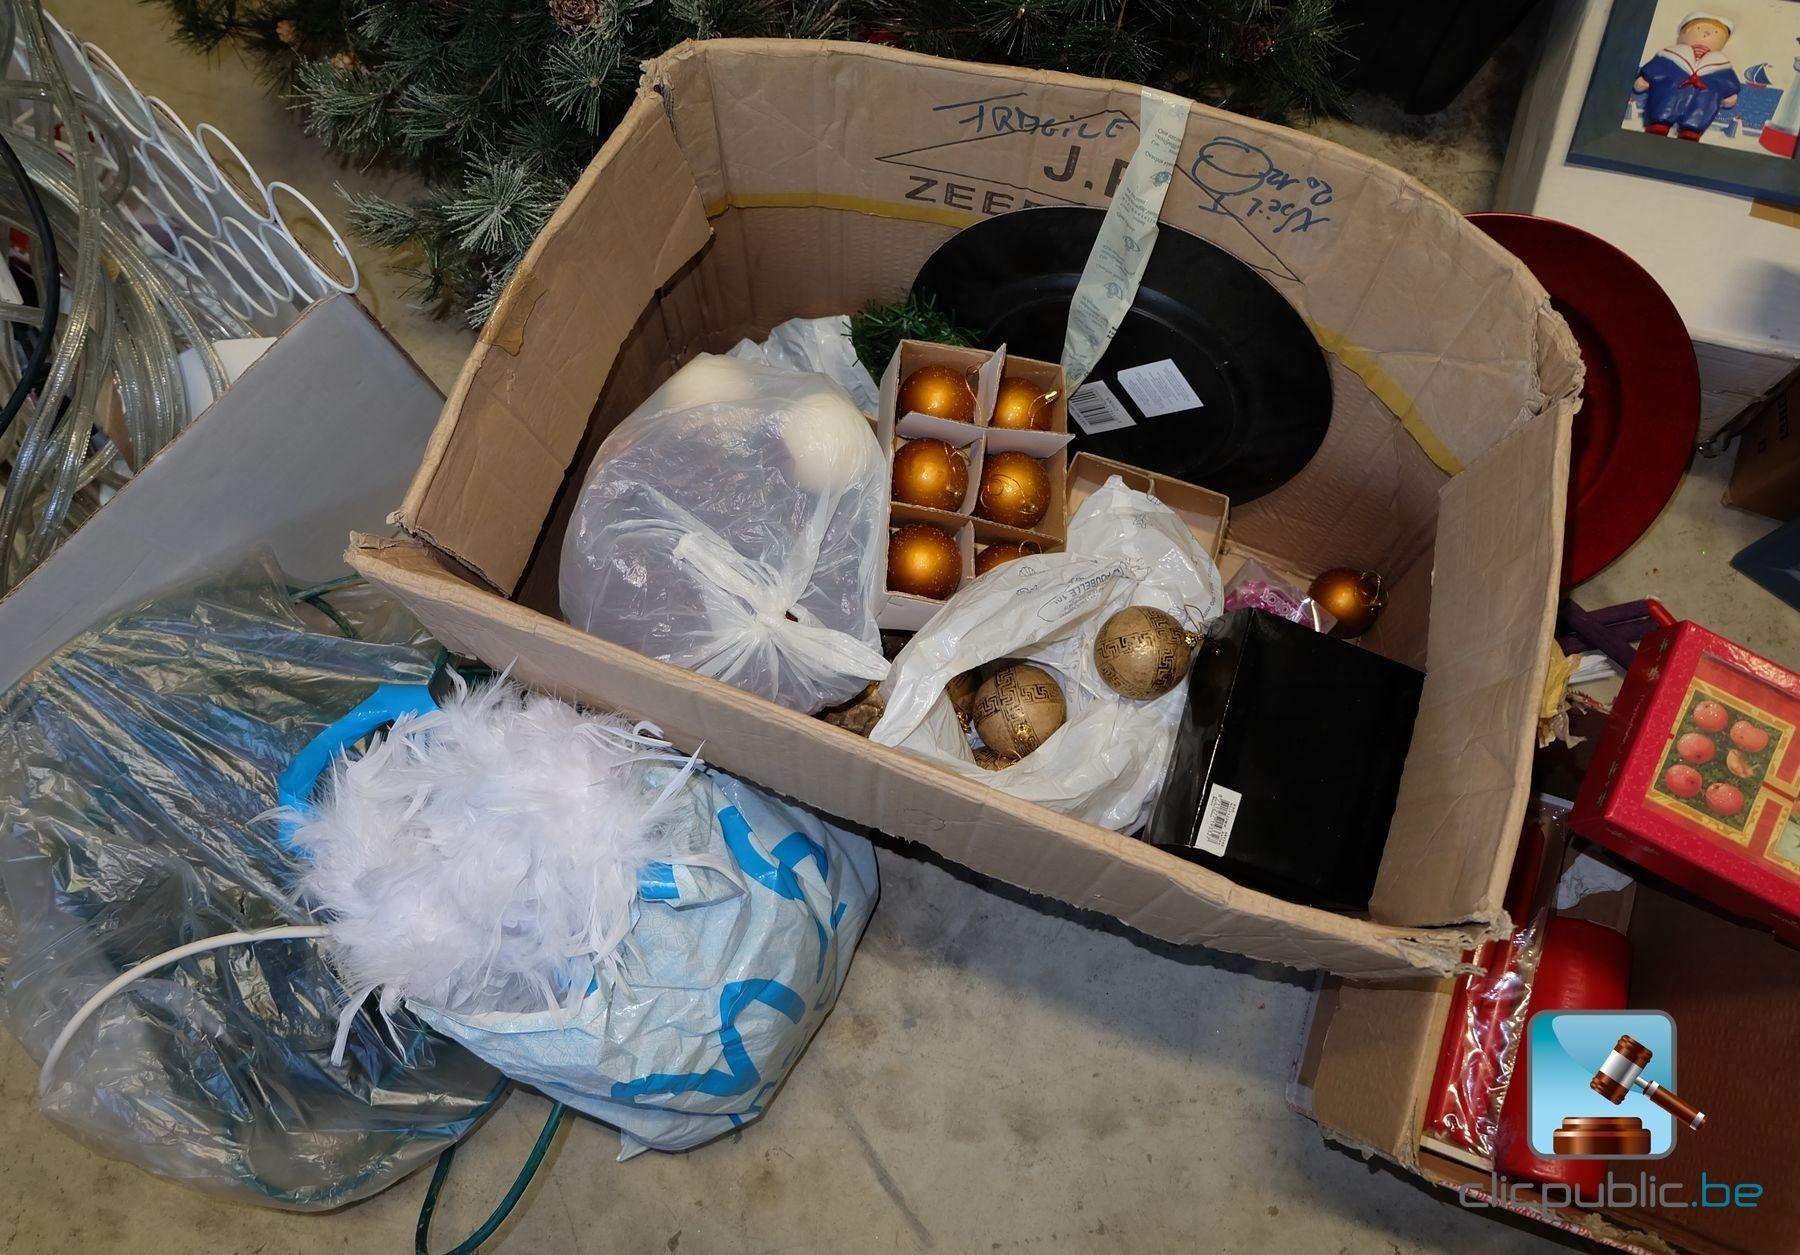 #69422F Décorations De Noël (ref. 27) à Vendre Sur Clicpublic.be 5319 decorations de noel a vendre 1800x1255 px @ aertt.com